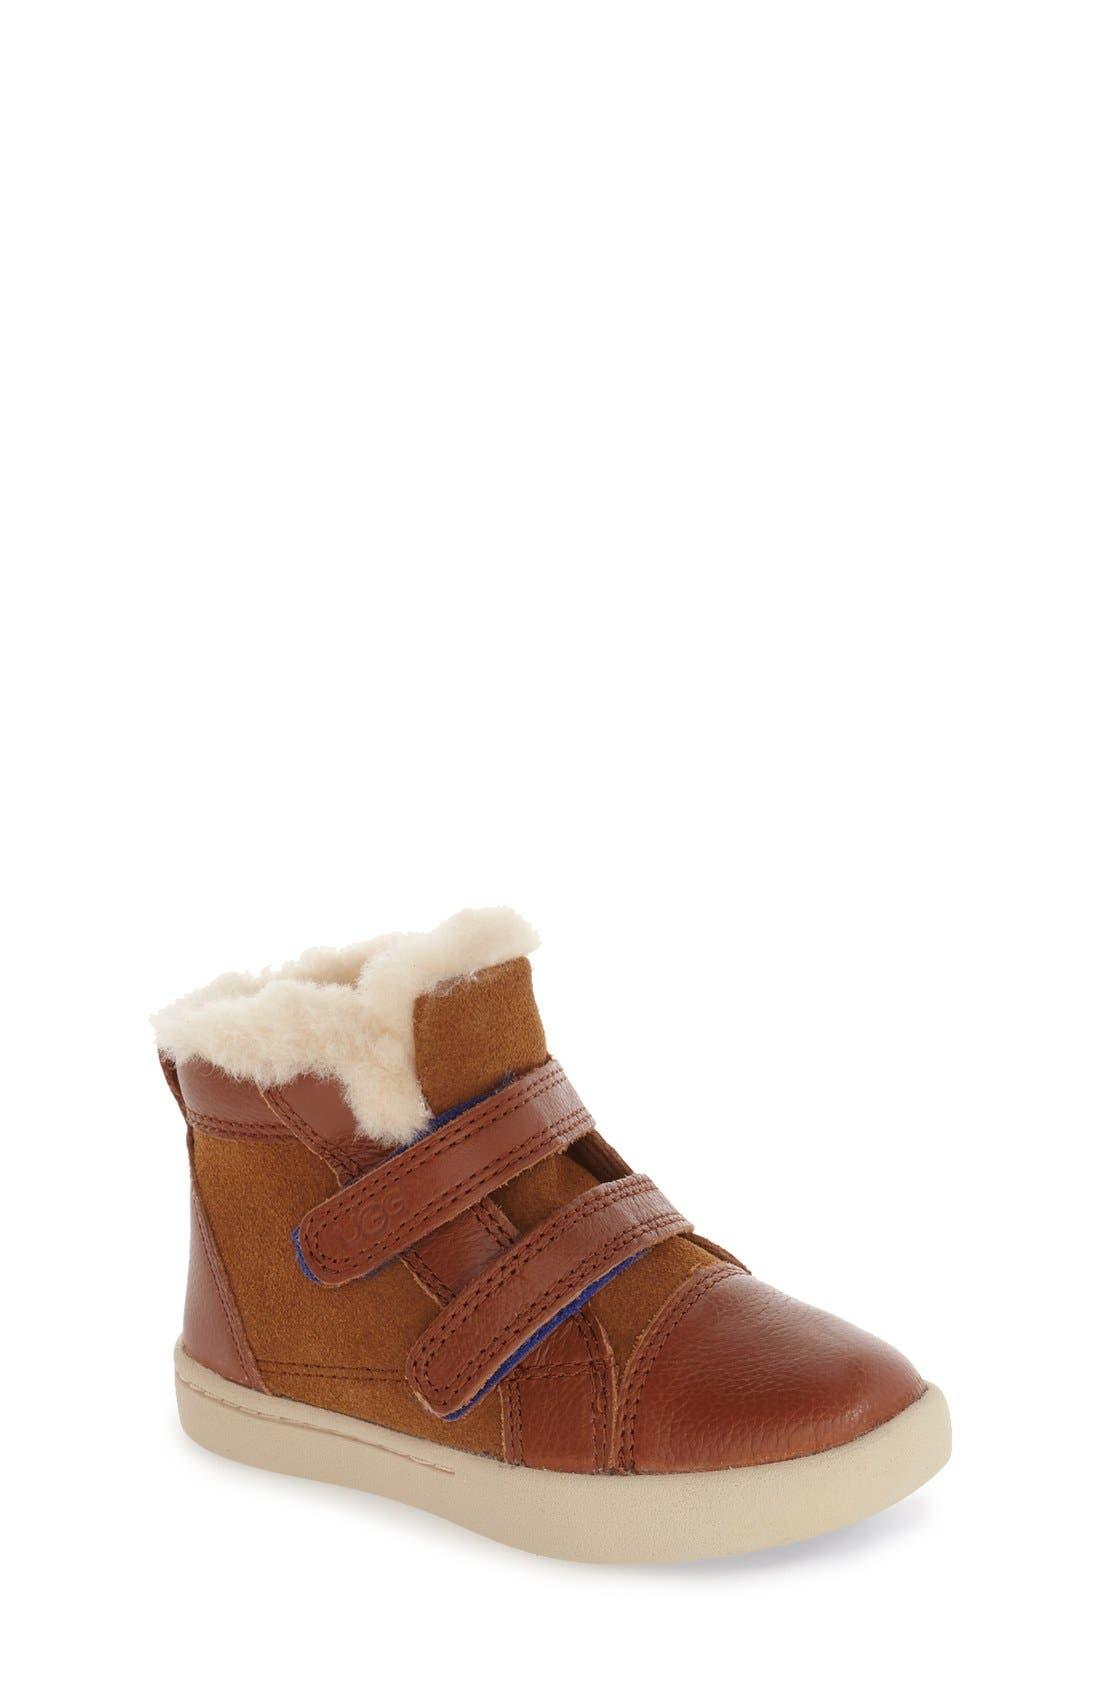 Rennon High Top Sneaker,                             Main thumbnail 2, color,